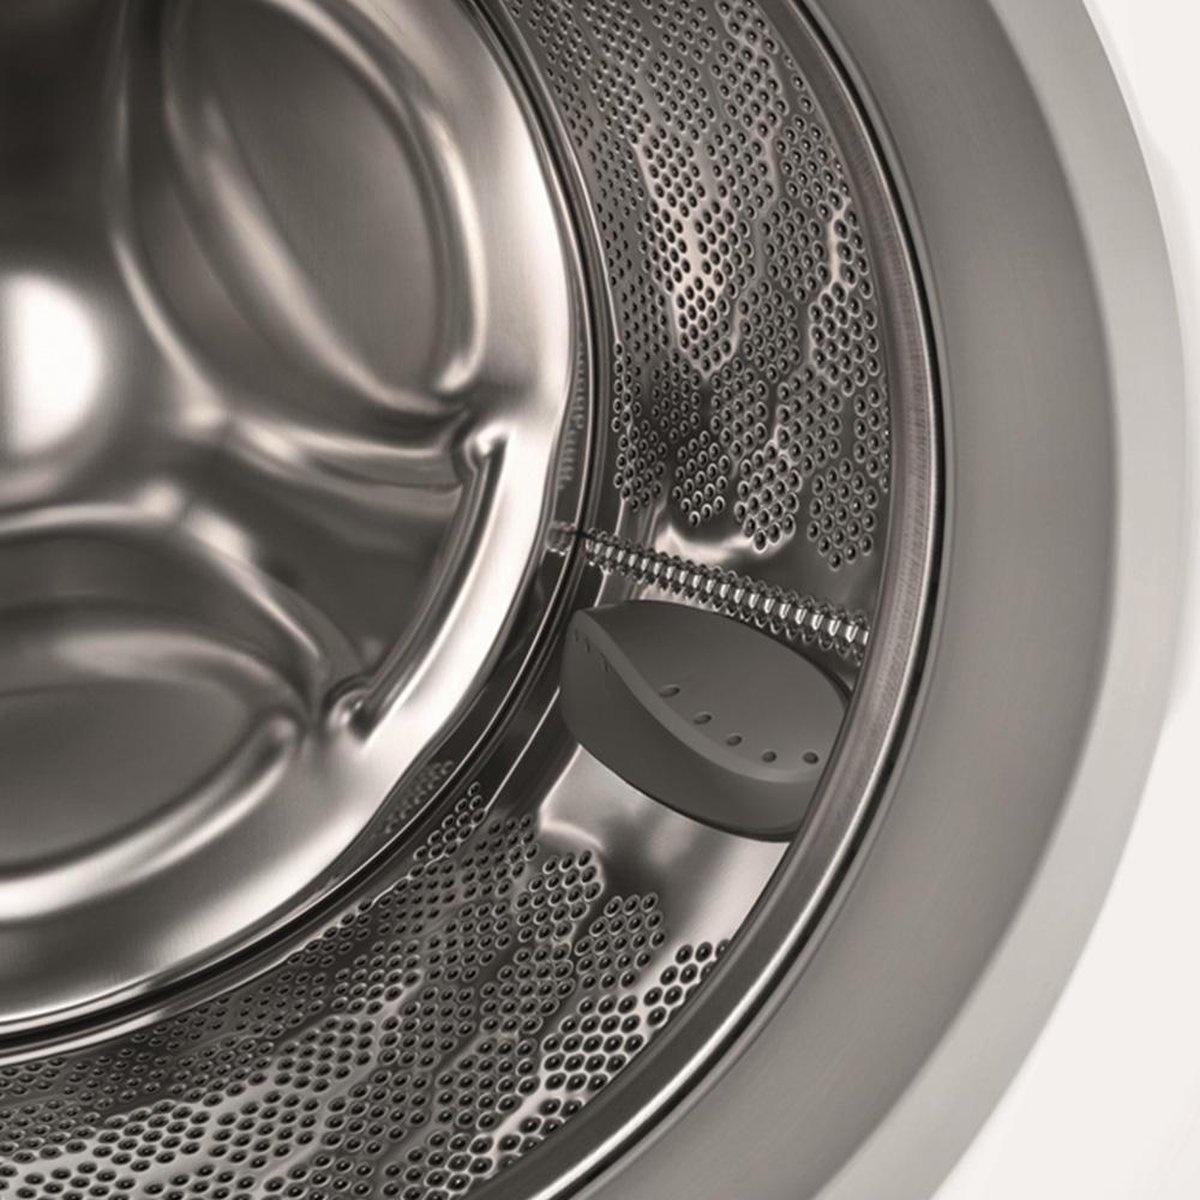 AEG AEG L6FBBERLIN - Wasmachine - 9KG - 1400tpm - A+++